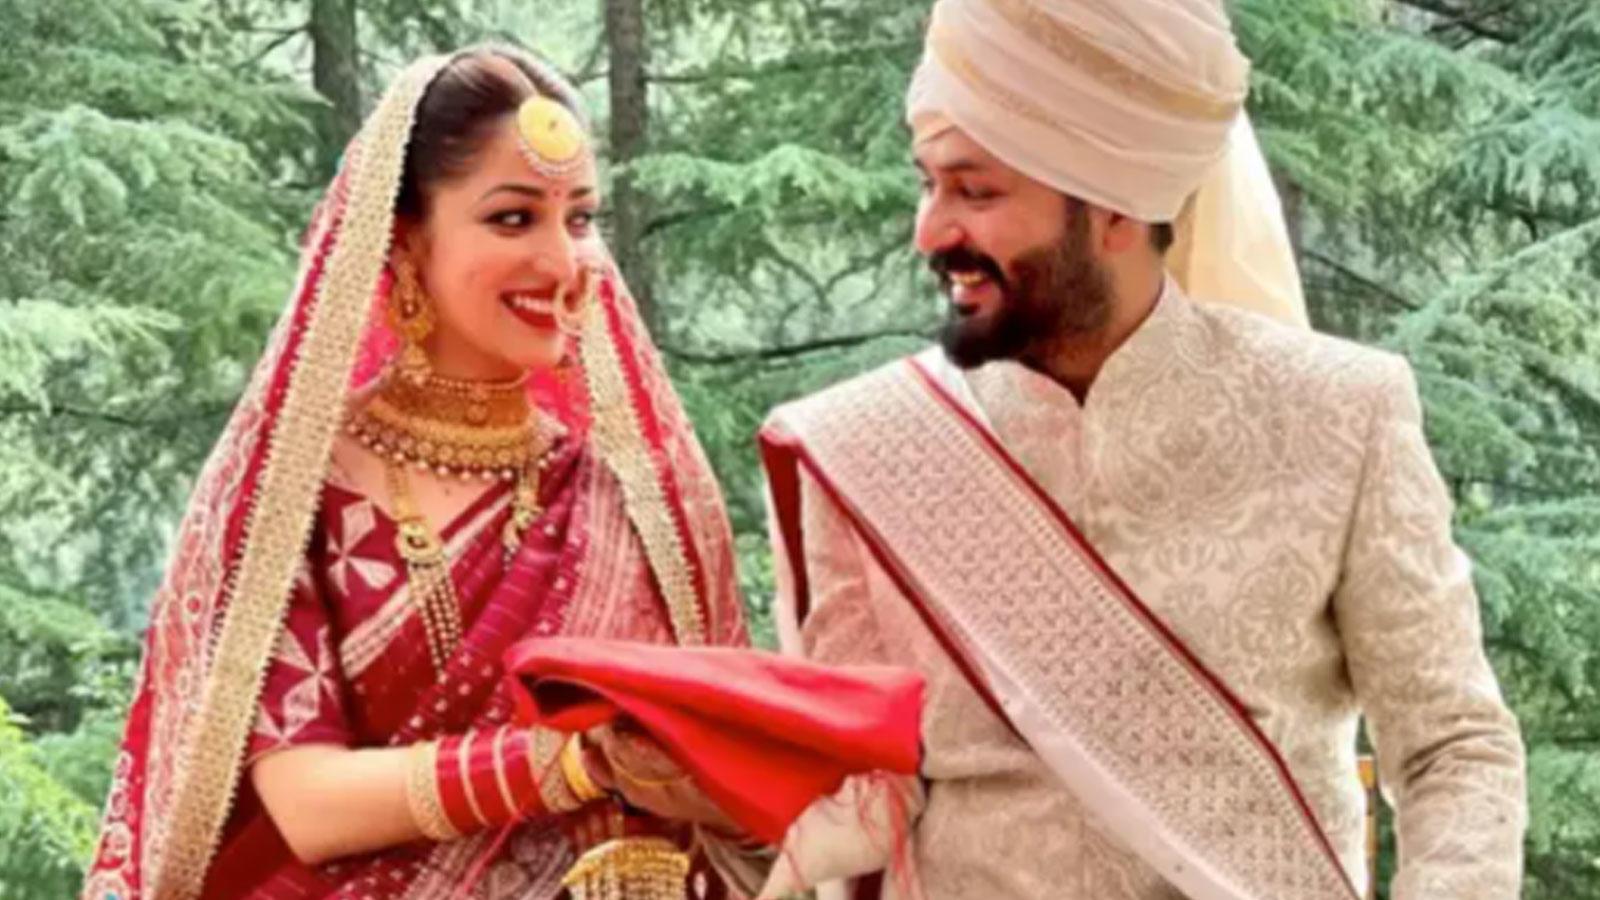 yami-gautam-reveals-grandma-connection-to-her-impromptu-wedding-with-aditya-dhar